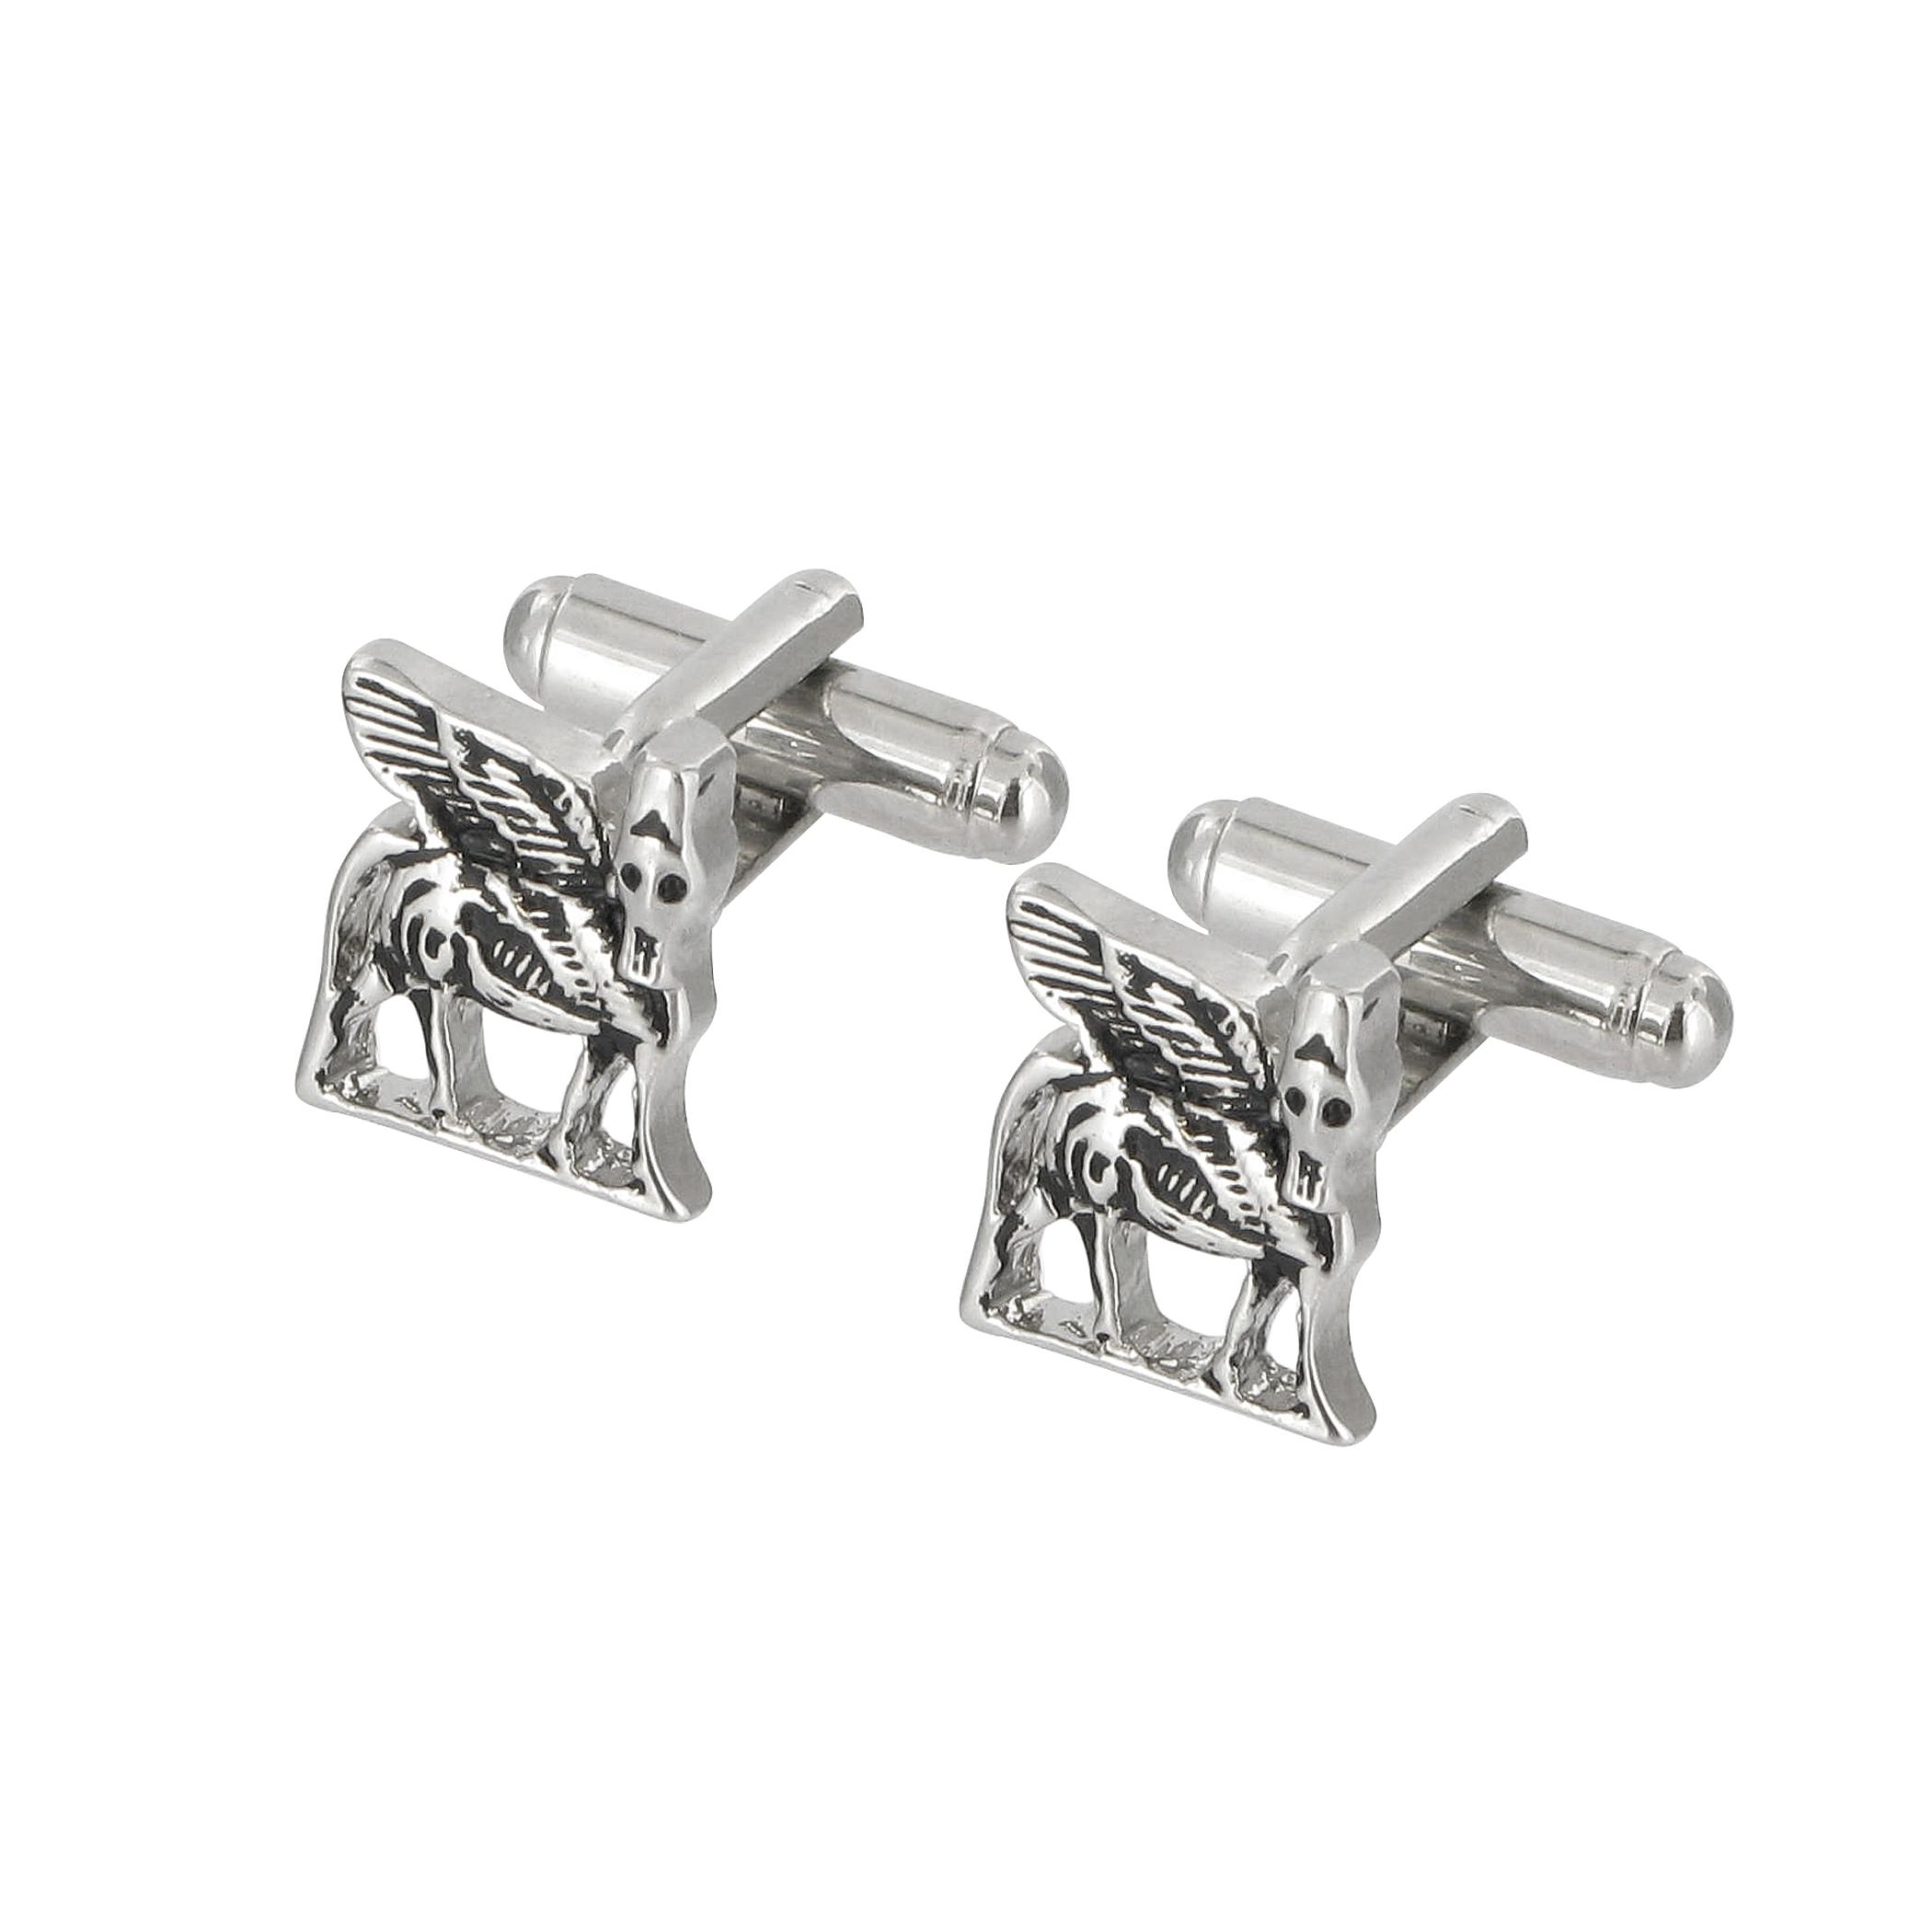 Winged bull cufflinks